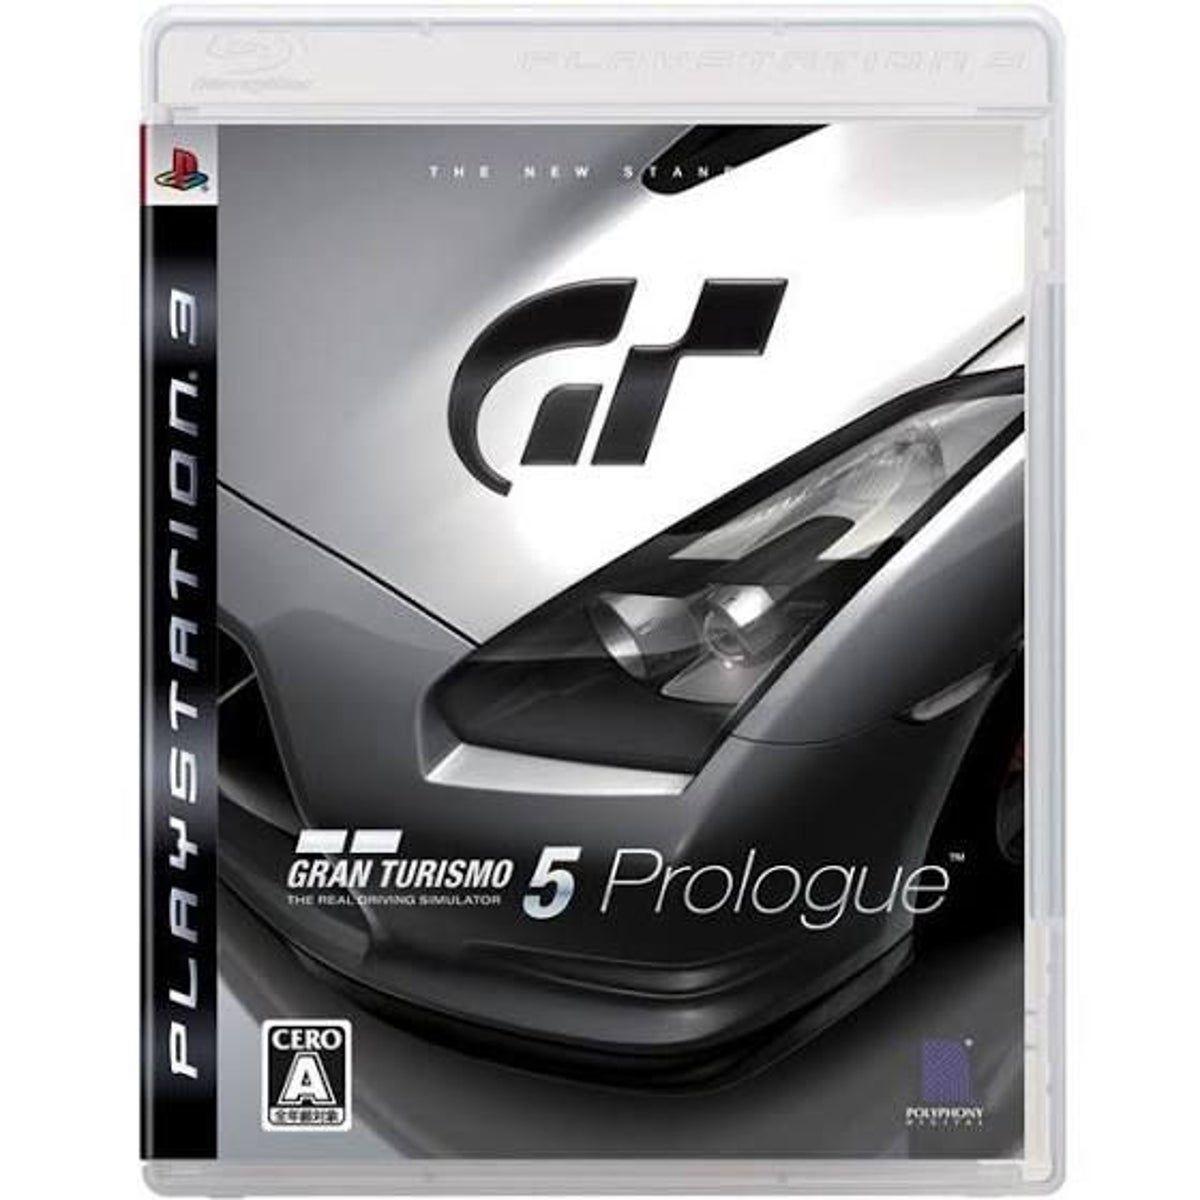 Gran Turismo 5 Prologue Ps3 Car Games Forza Motorsport Racing Games